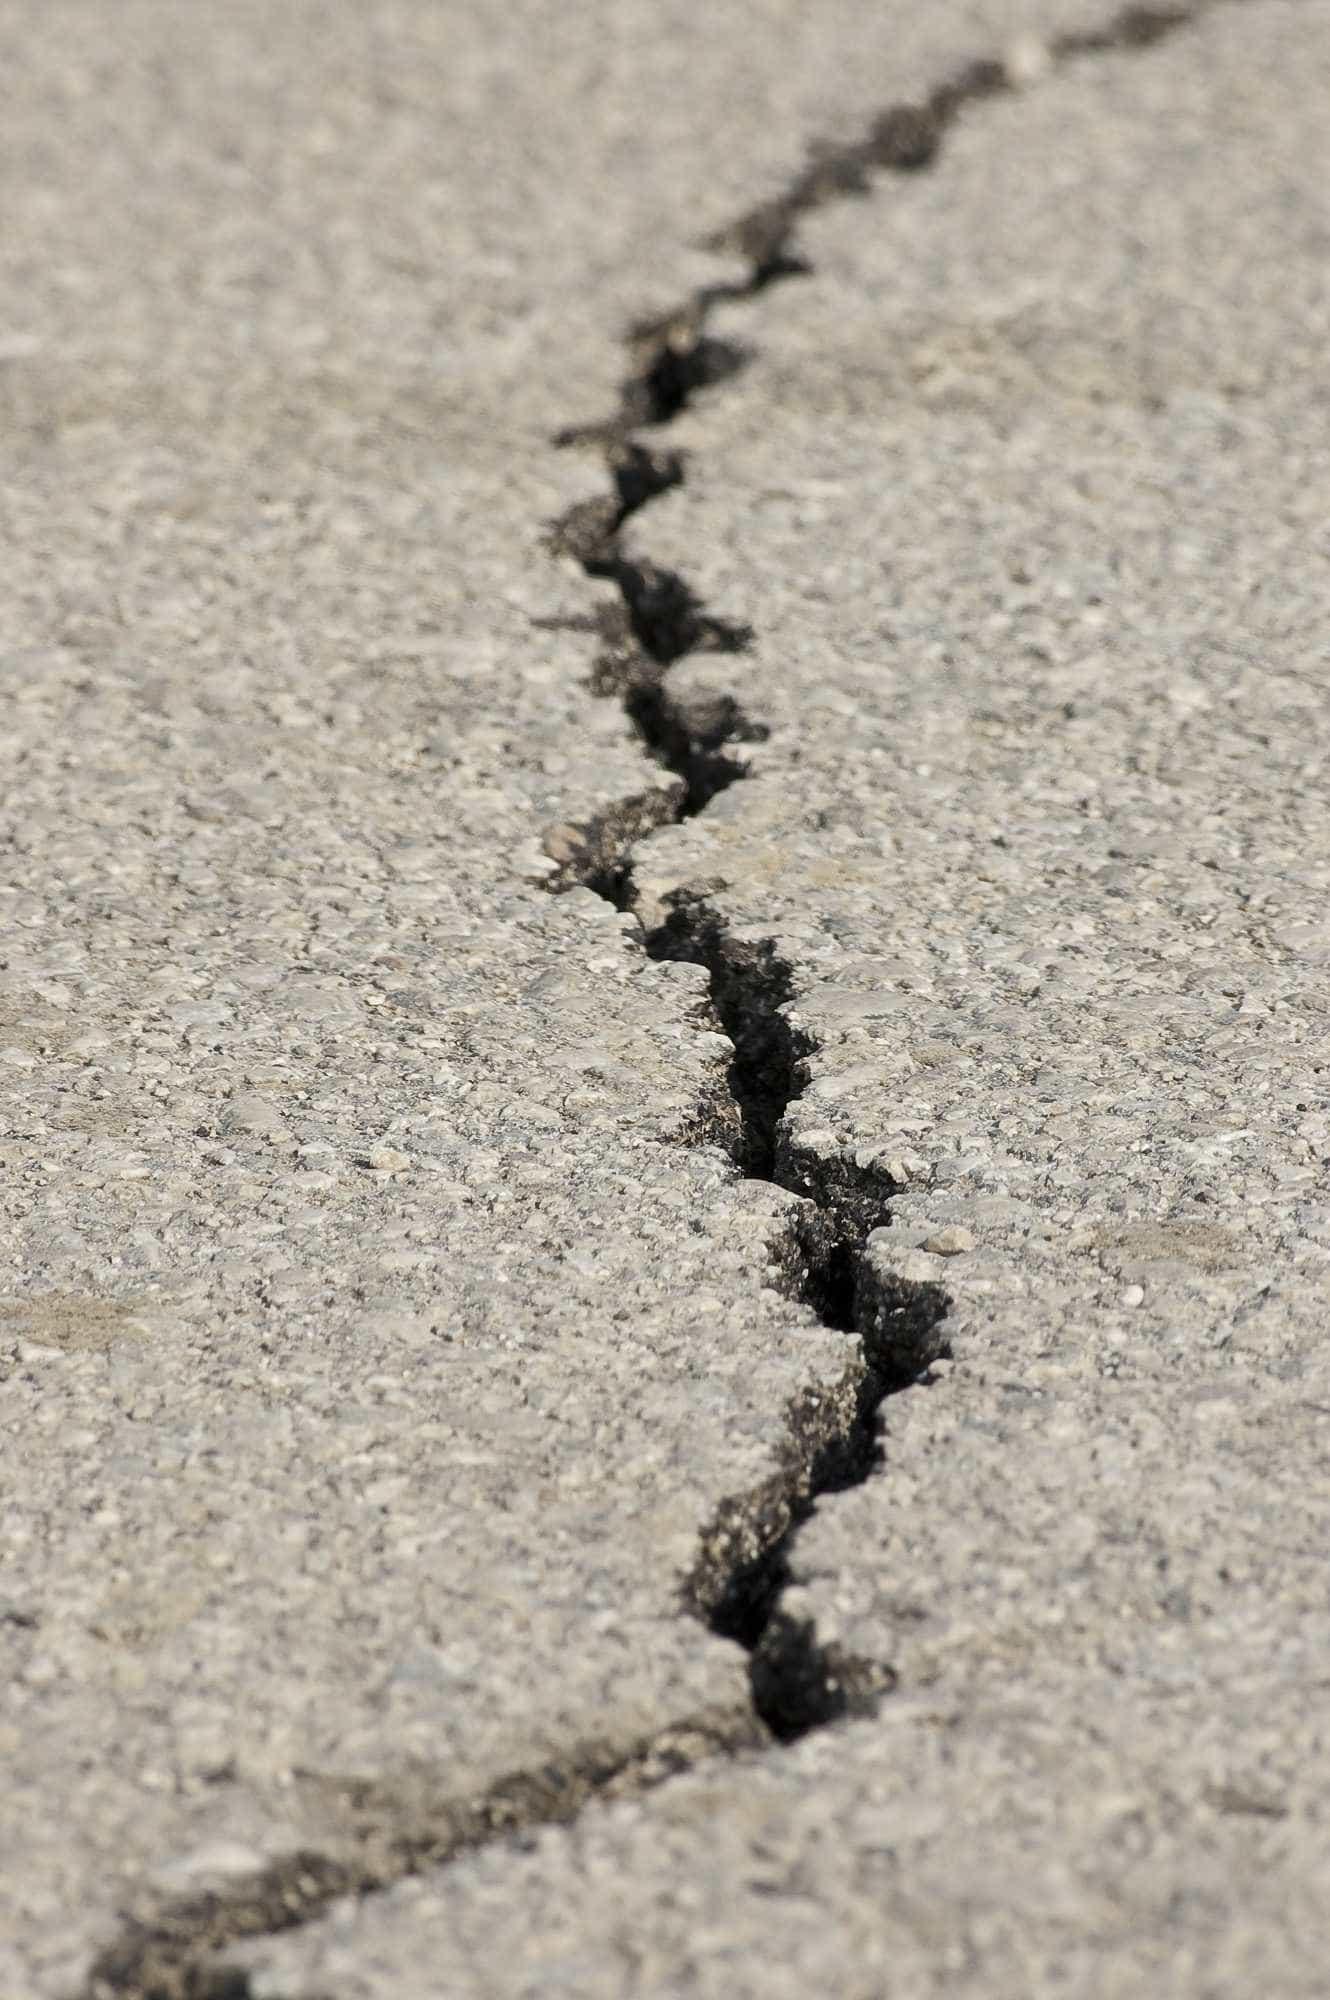 Forte terremoto no Irã deixa ao menos 2 mortos e 240 feridos